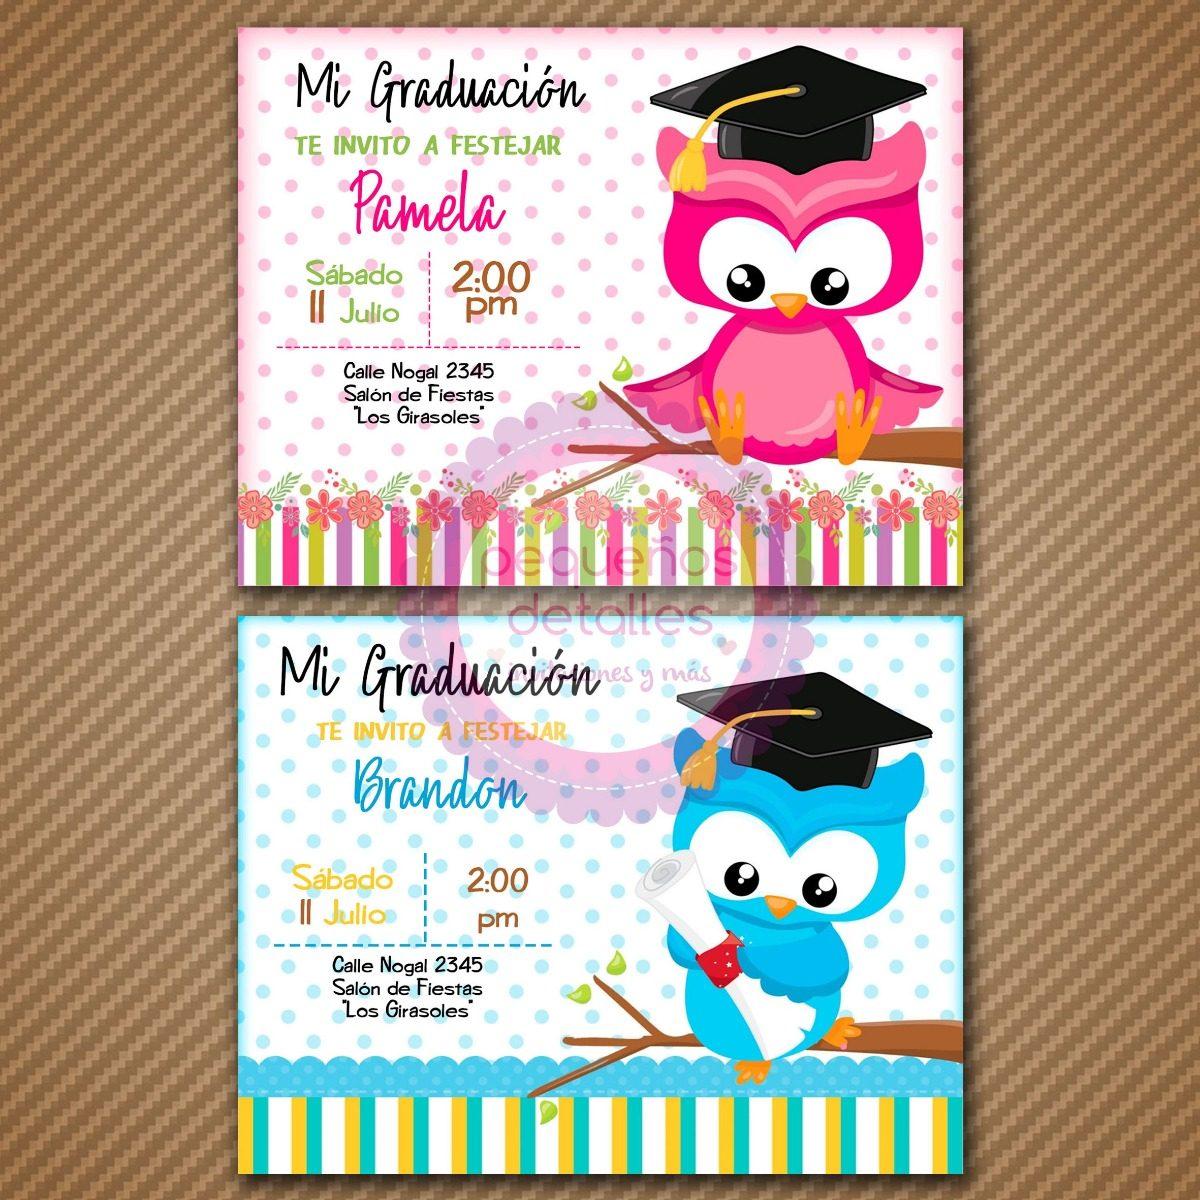 invitaciones digitales graduaci u00f3n kinder primaria fiesta